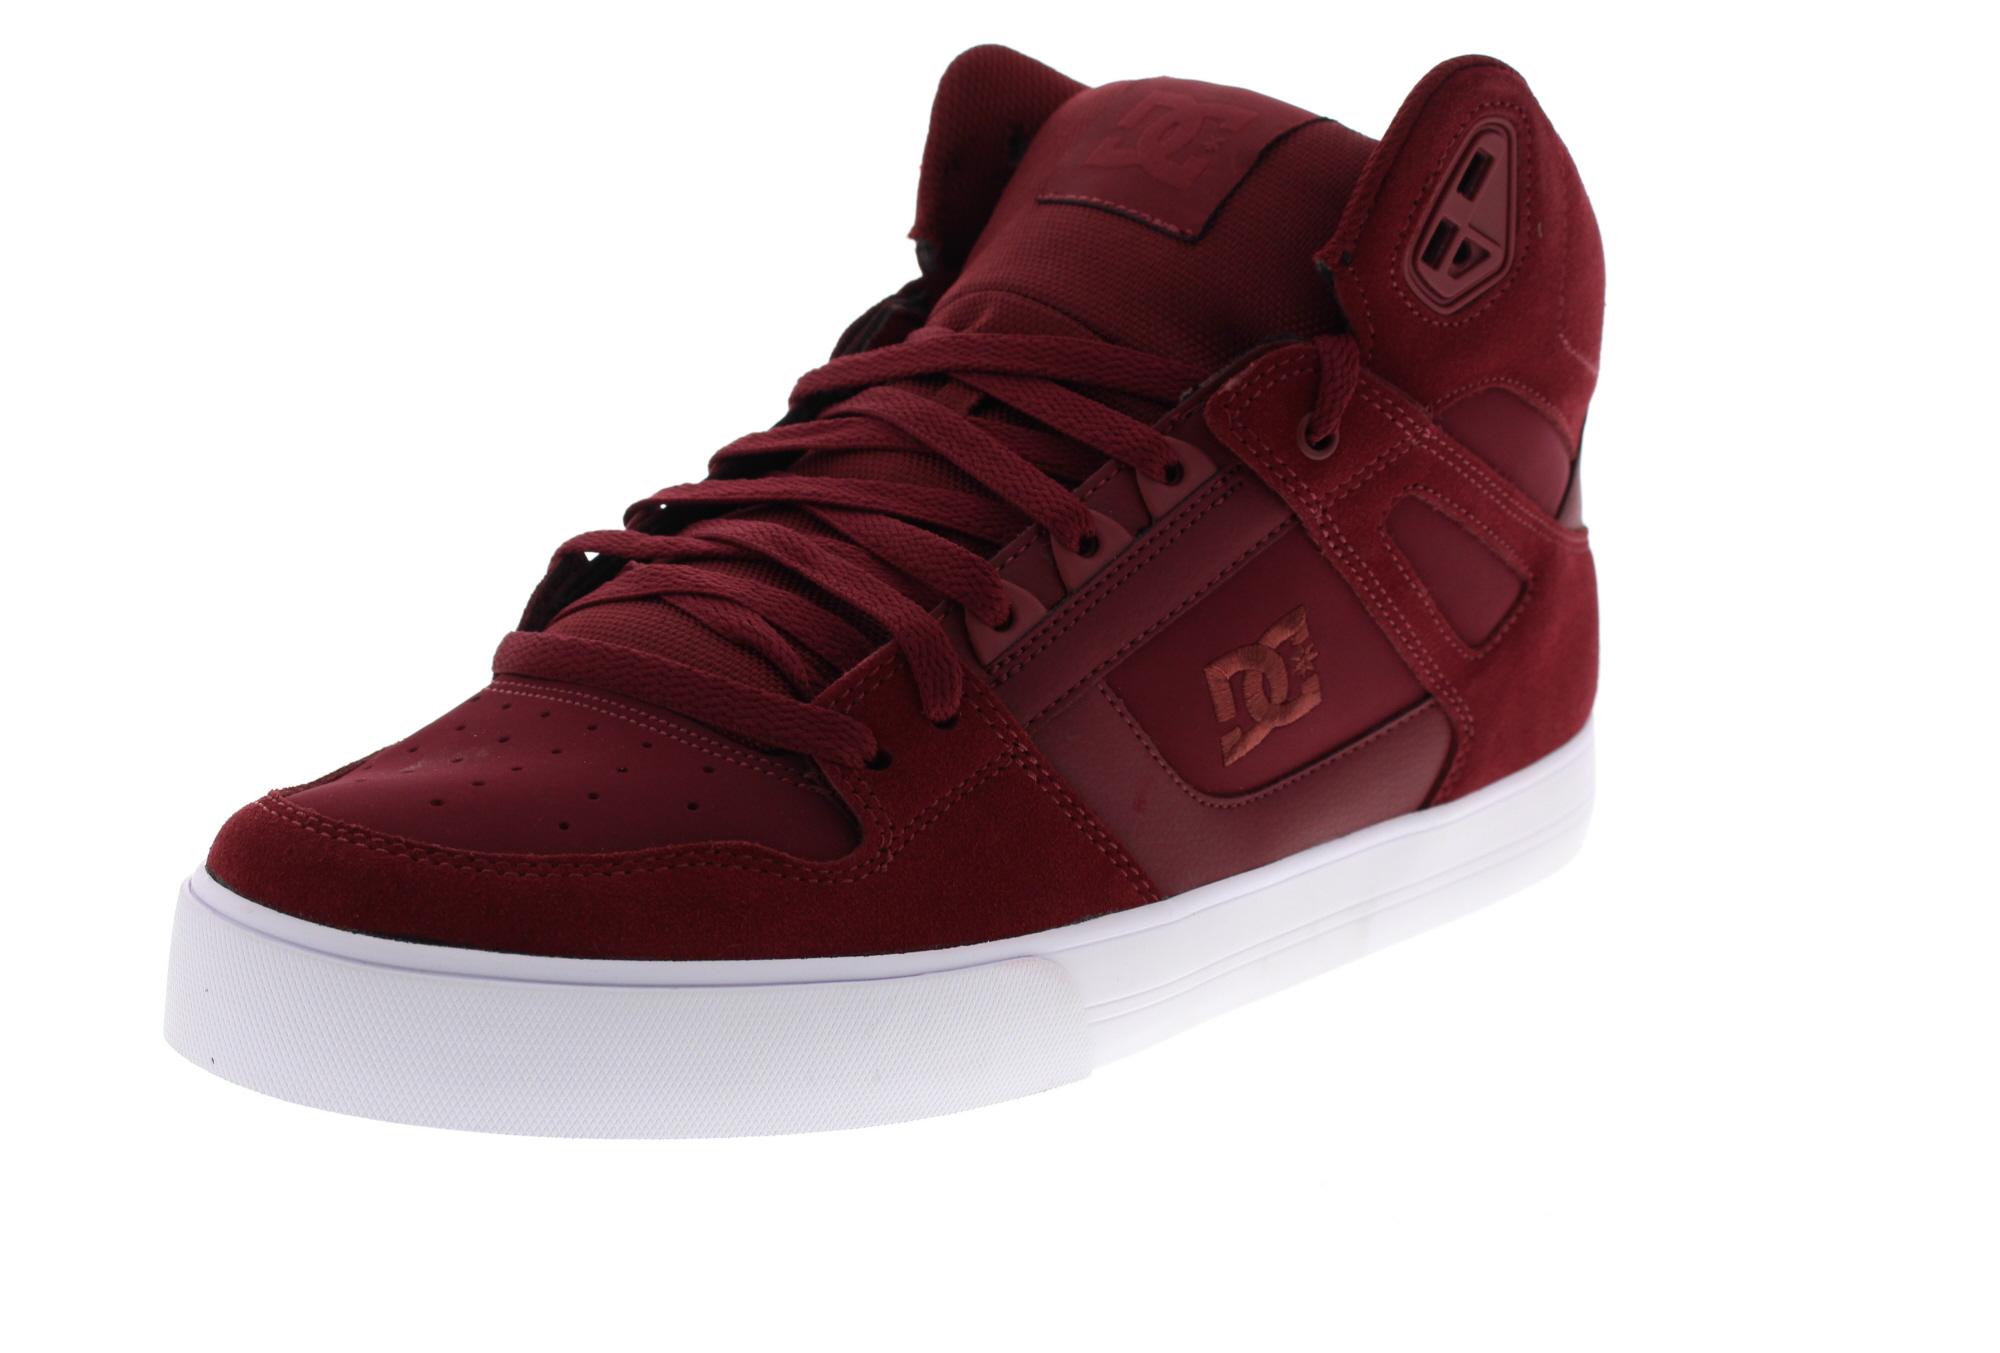 DC Sneakers in Übergrößen - PURE HIGH-TOP WC - burgundy